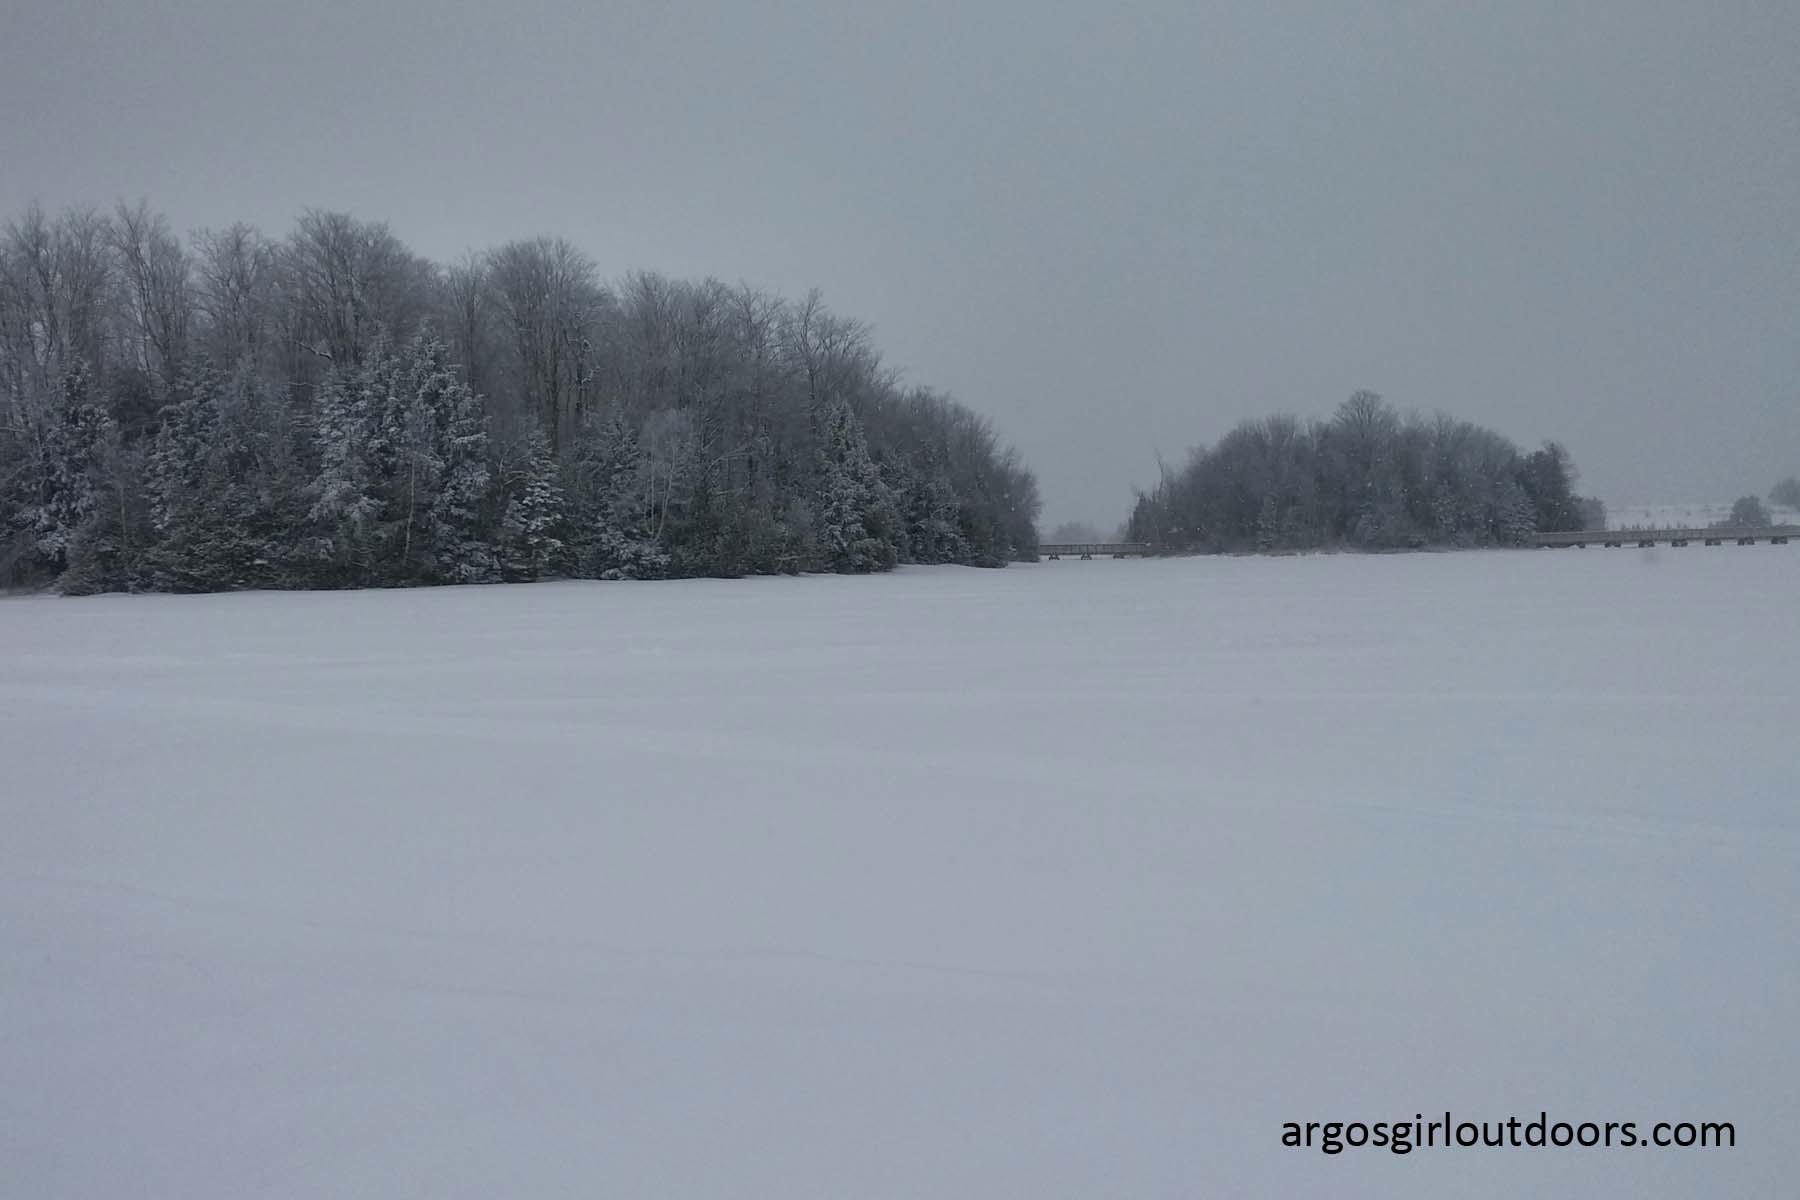 Ice fishing archives argosgirl outdoors for Freshwater fishing long island